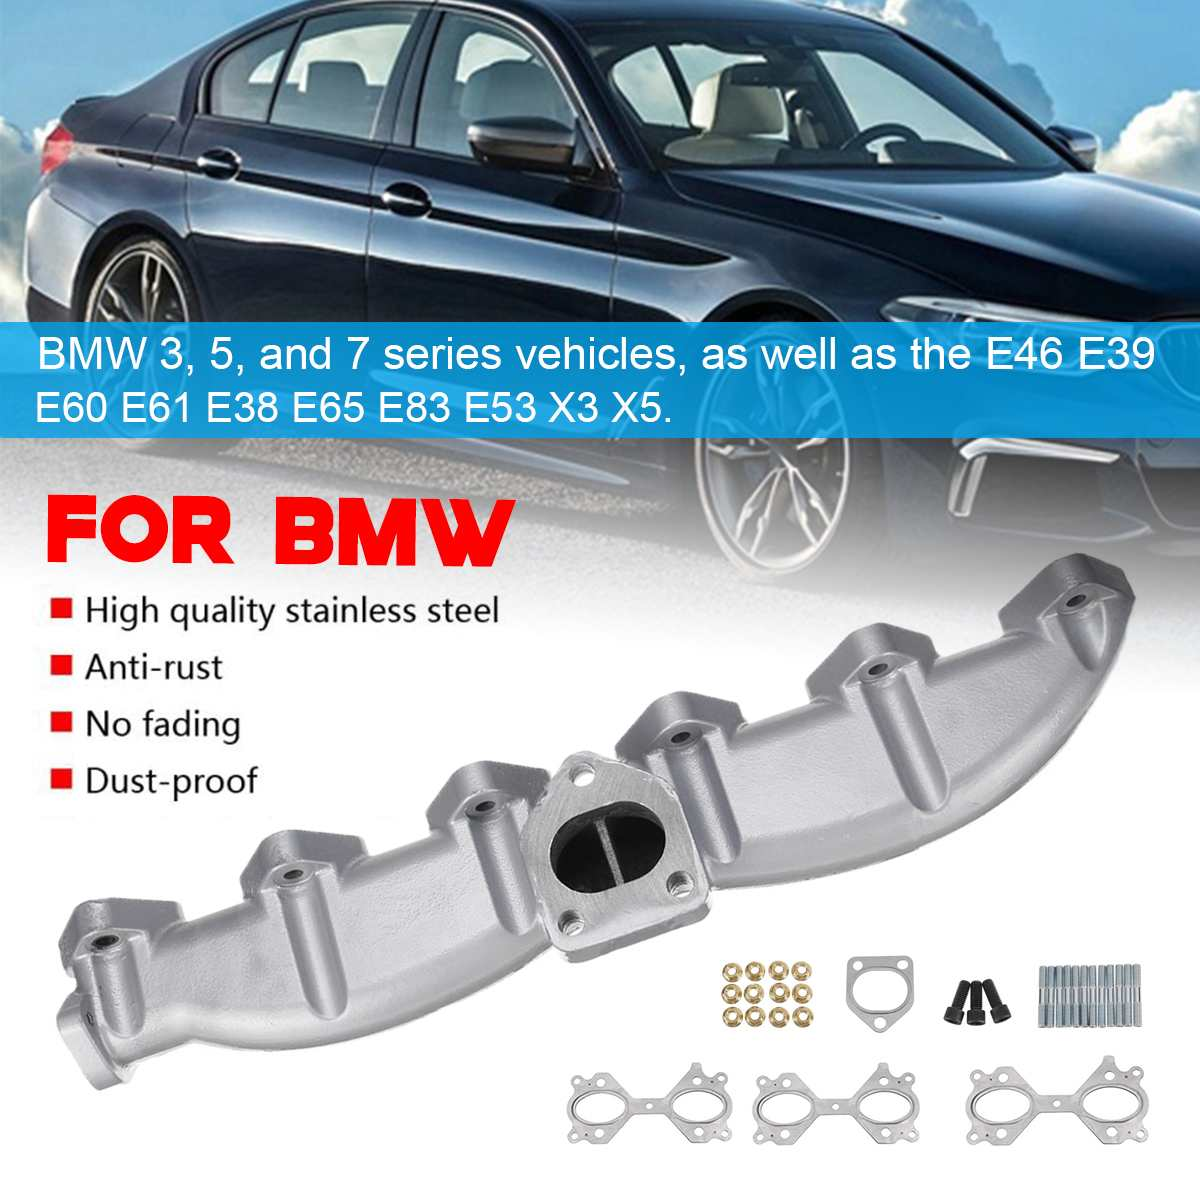 Car Exhaust Manifold for E46 E39 E60 E61 E38 E65 E83 E53 3 5 7 X3 X5